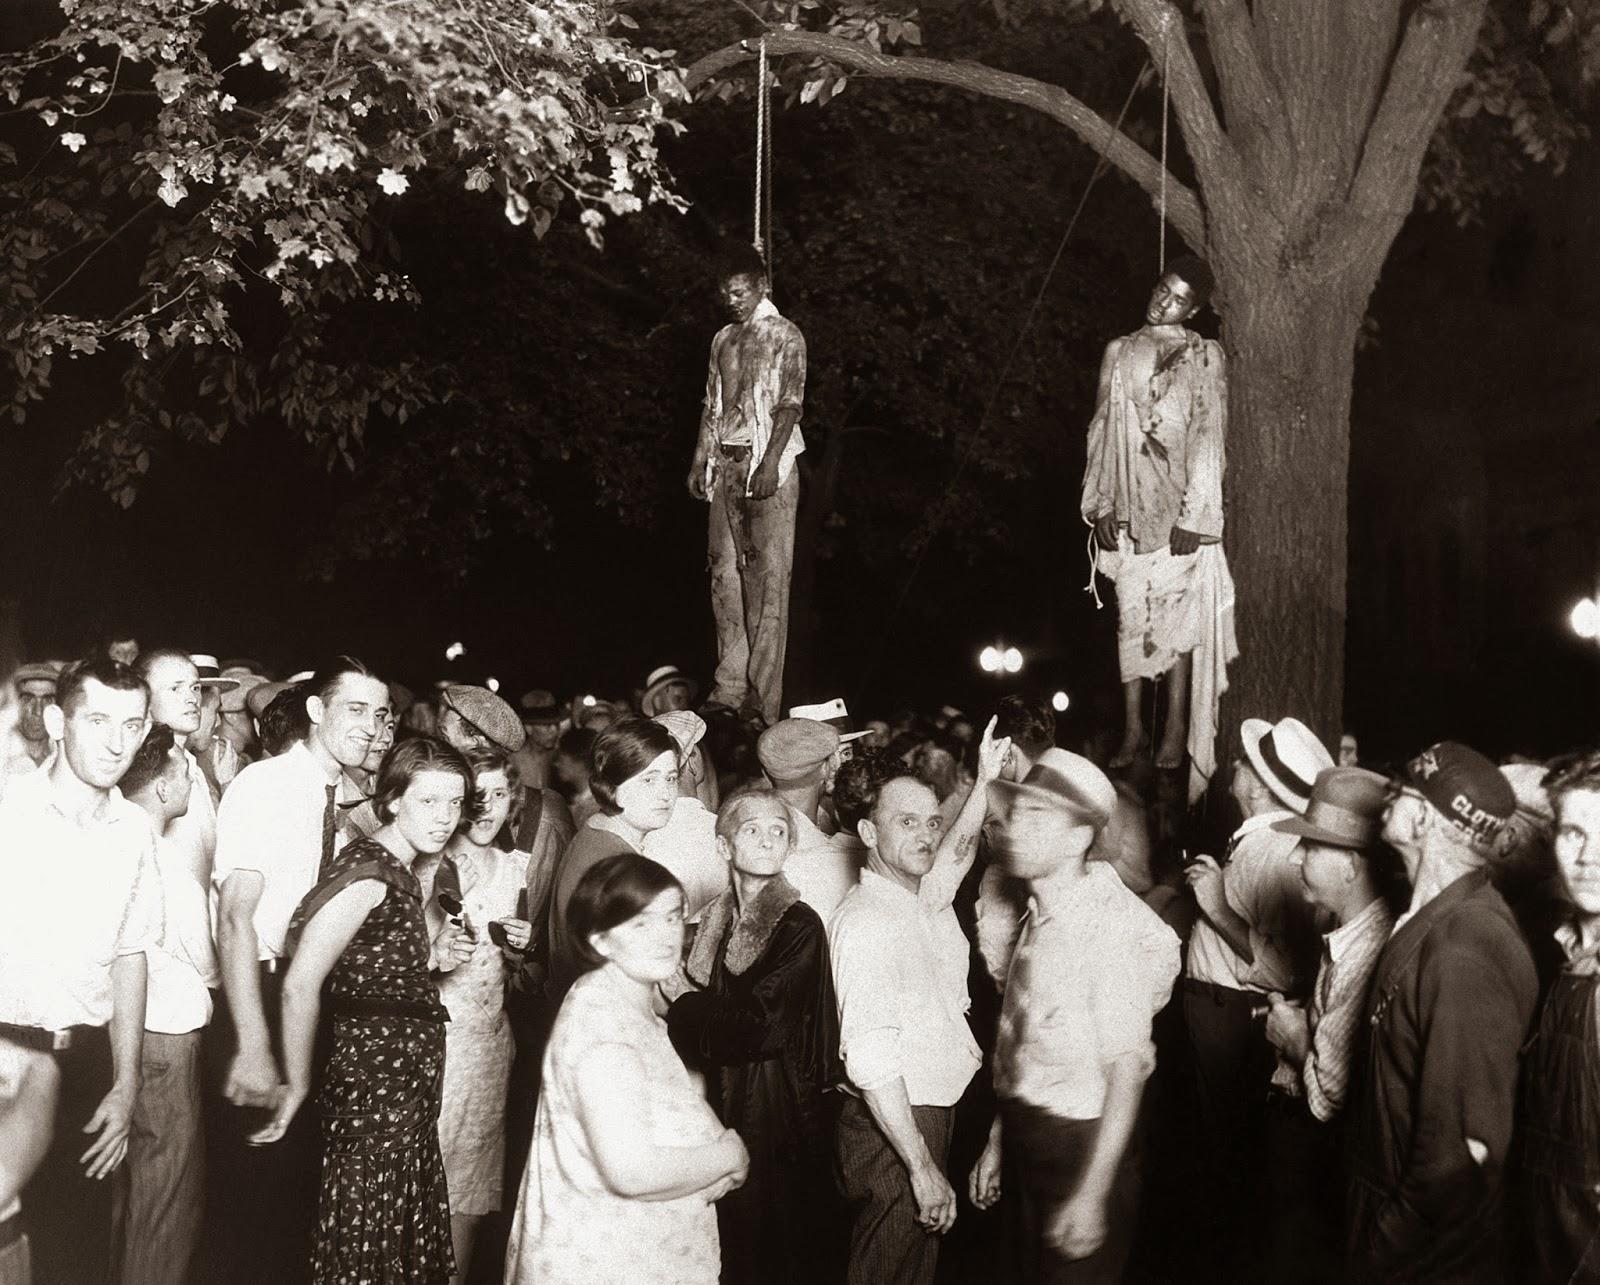 The+lynching+of+Thomas+Shipp+and+Abram+S